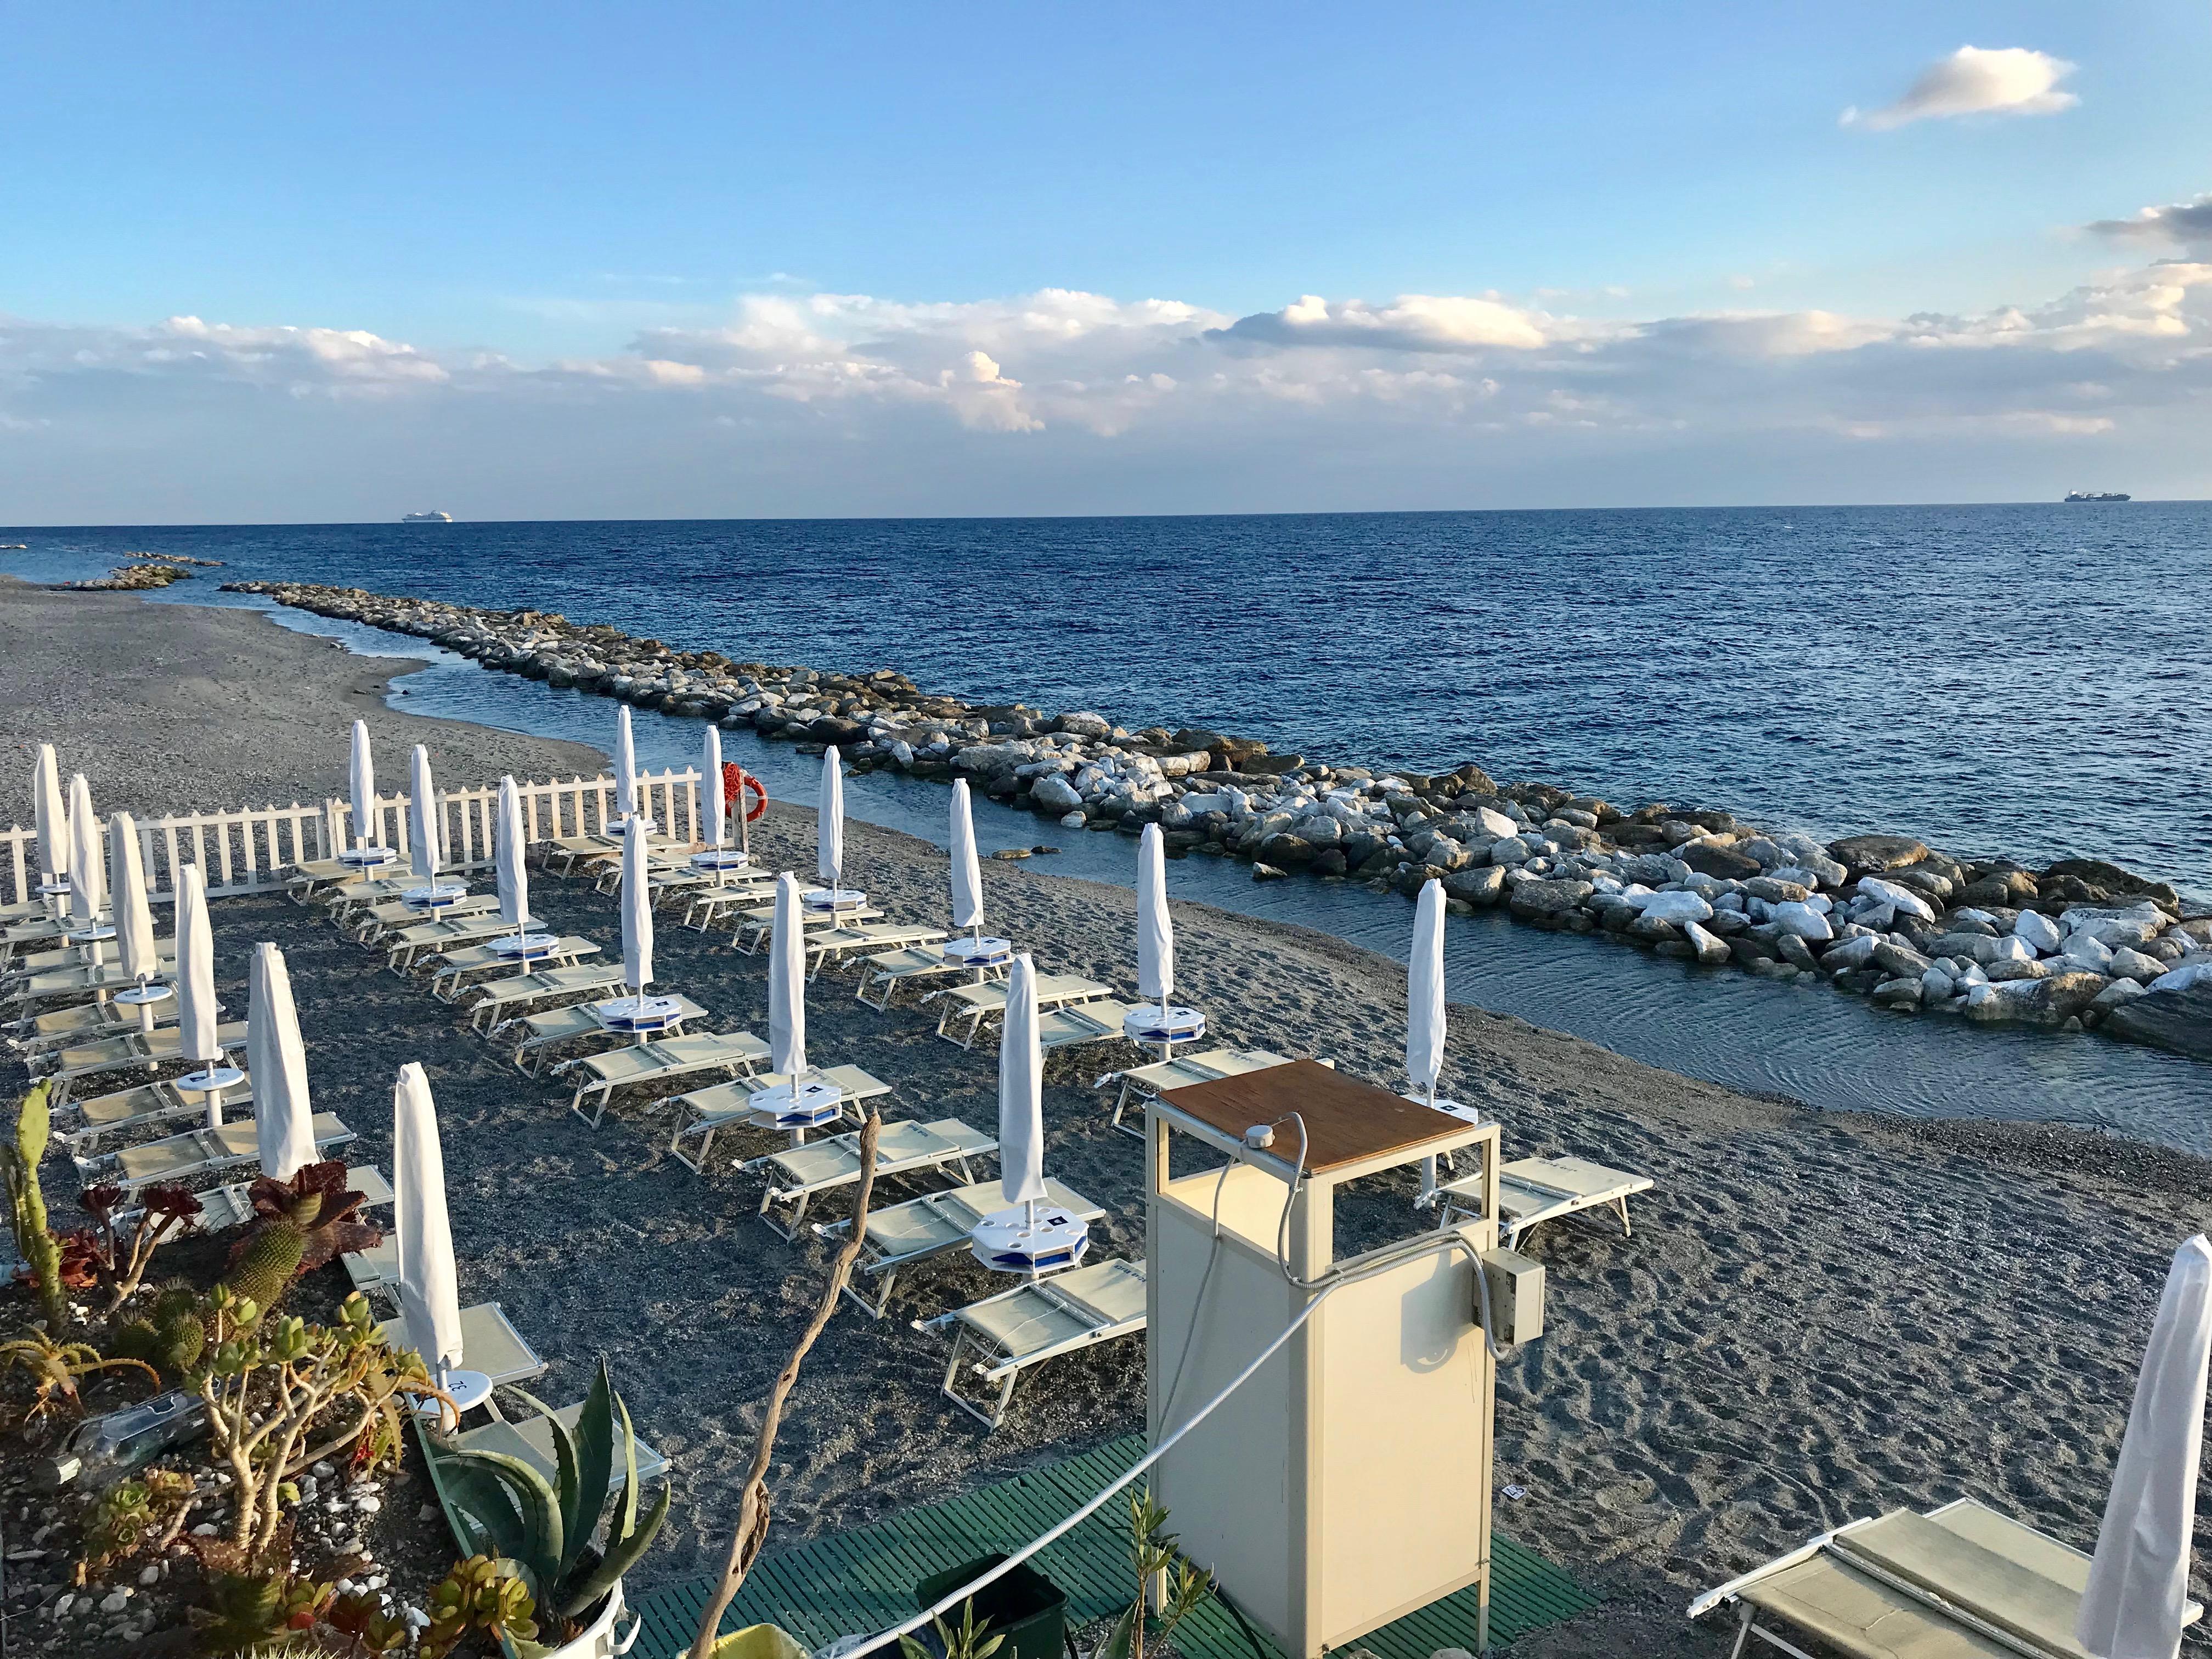 Sciao Beach